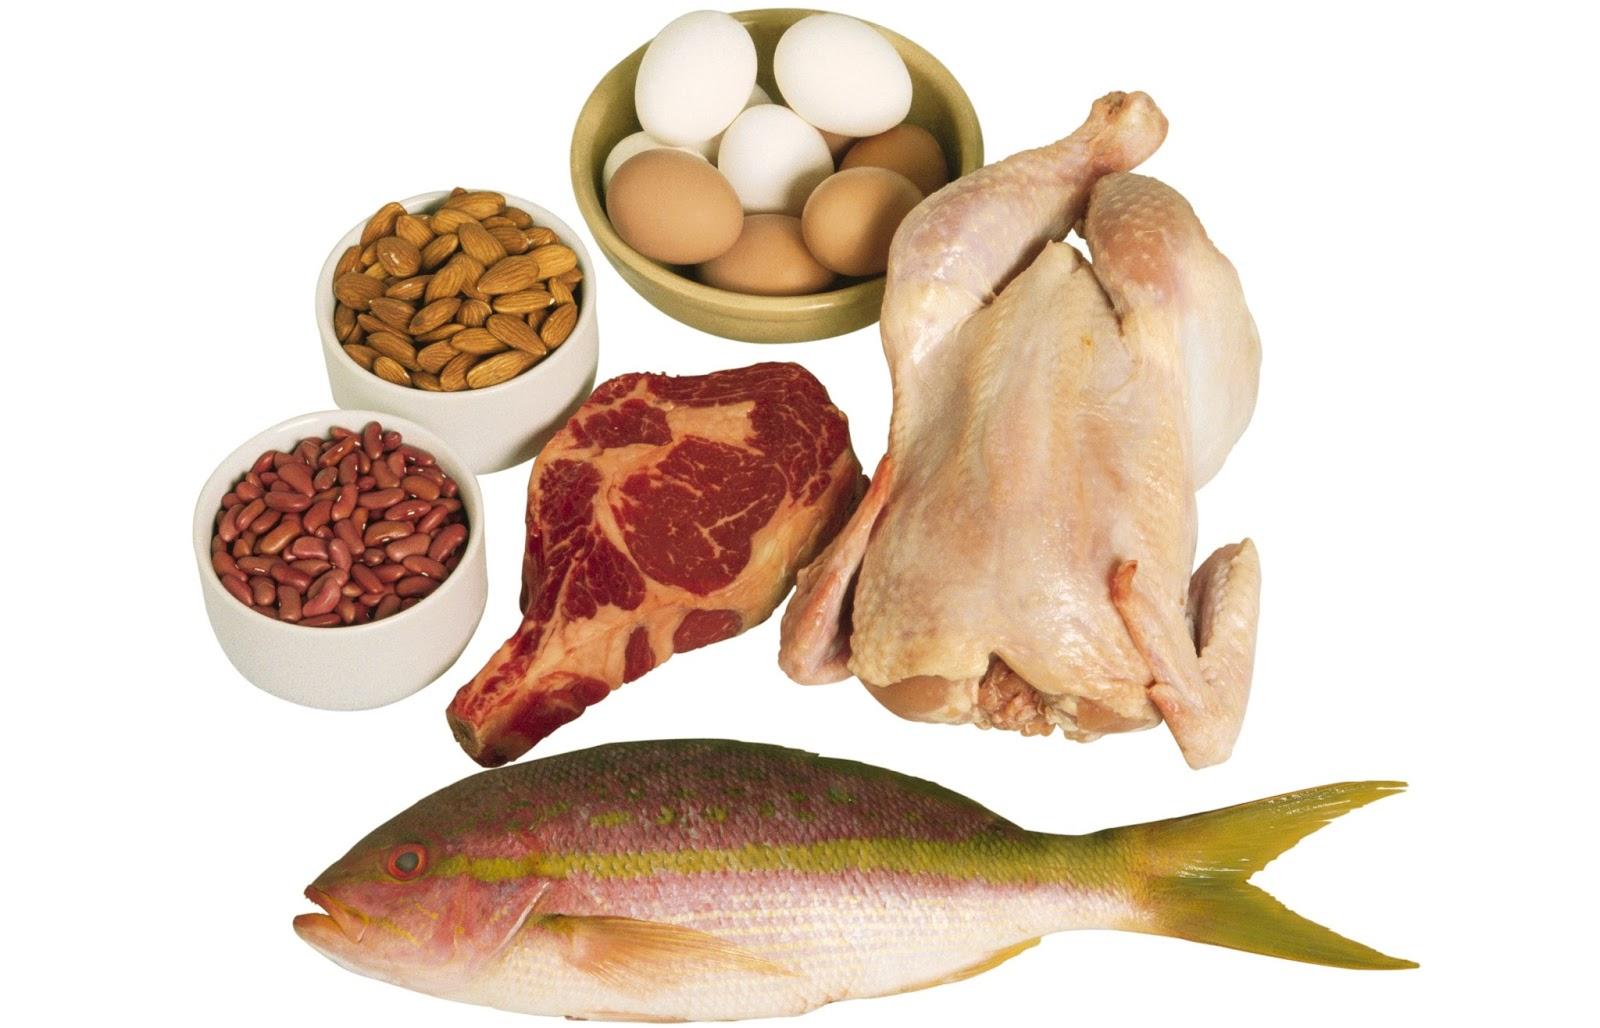 Protein İçeren Besinler ve Protein Kalitesi